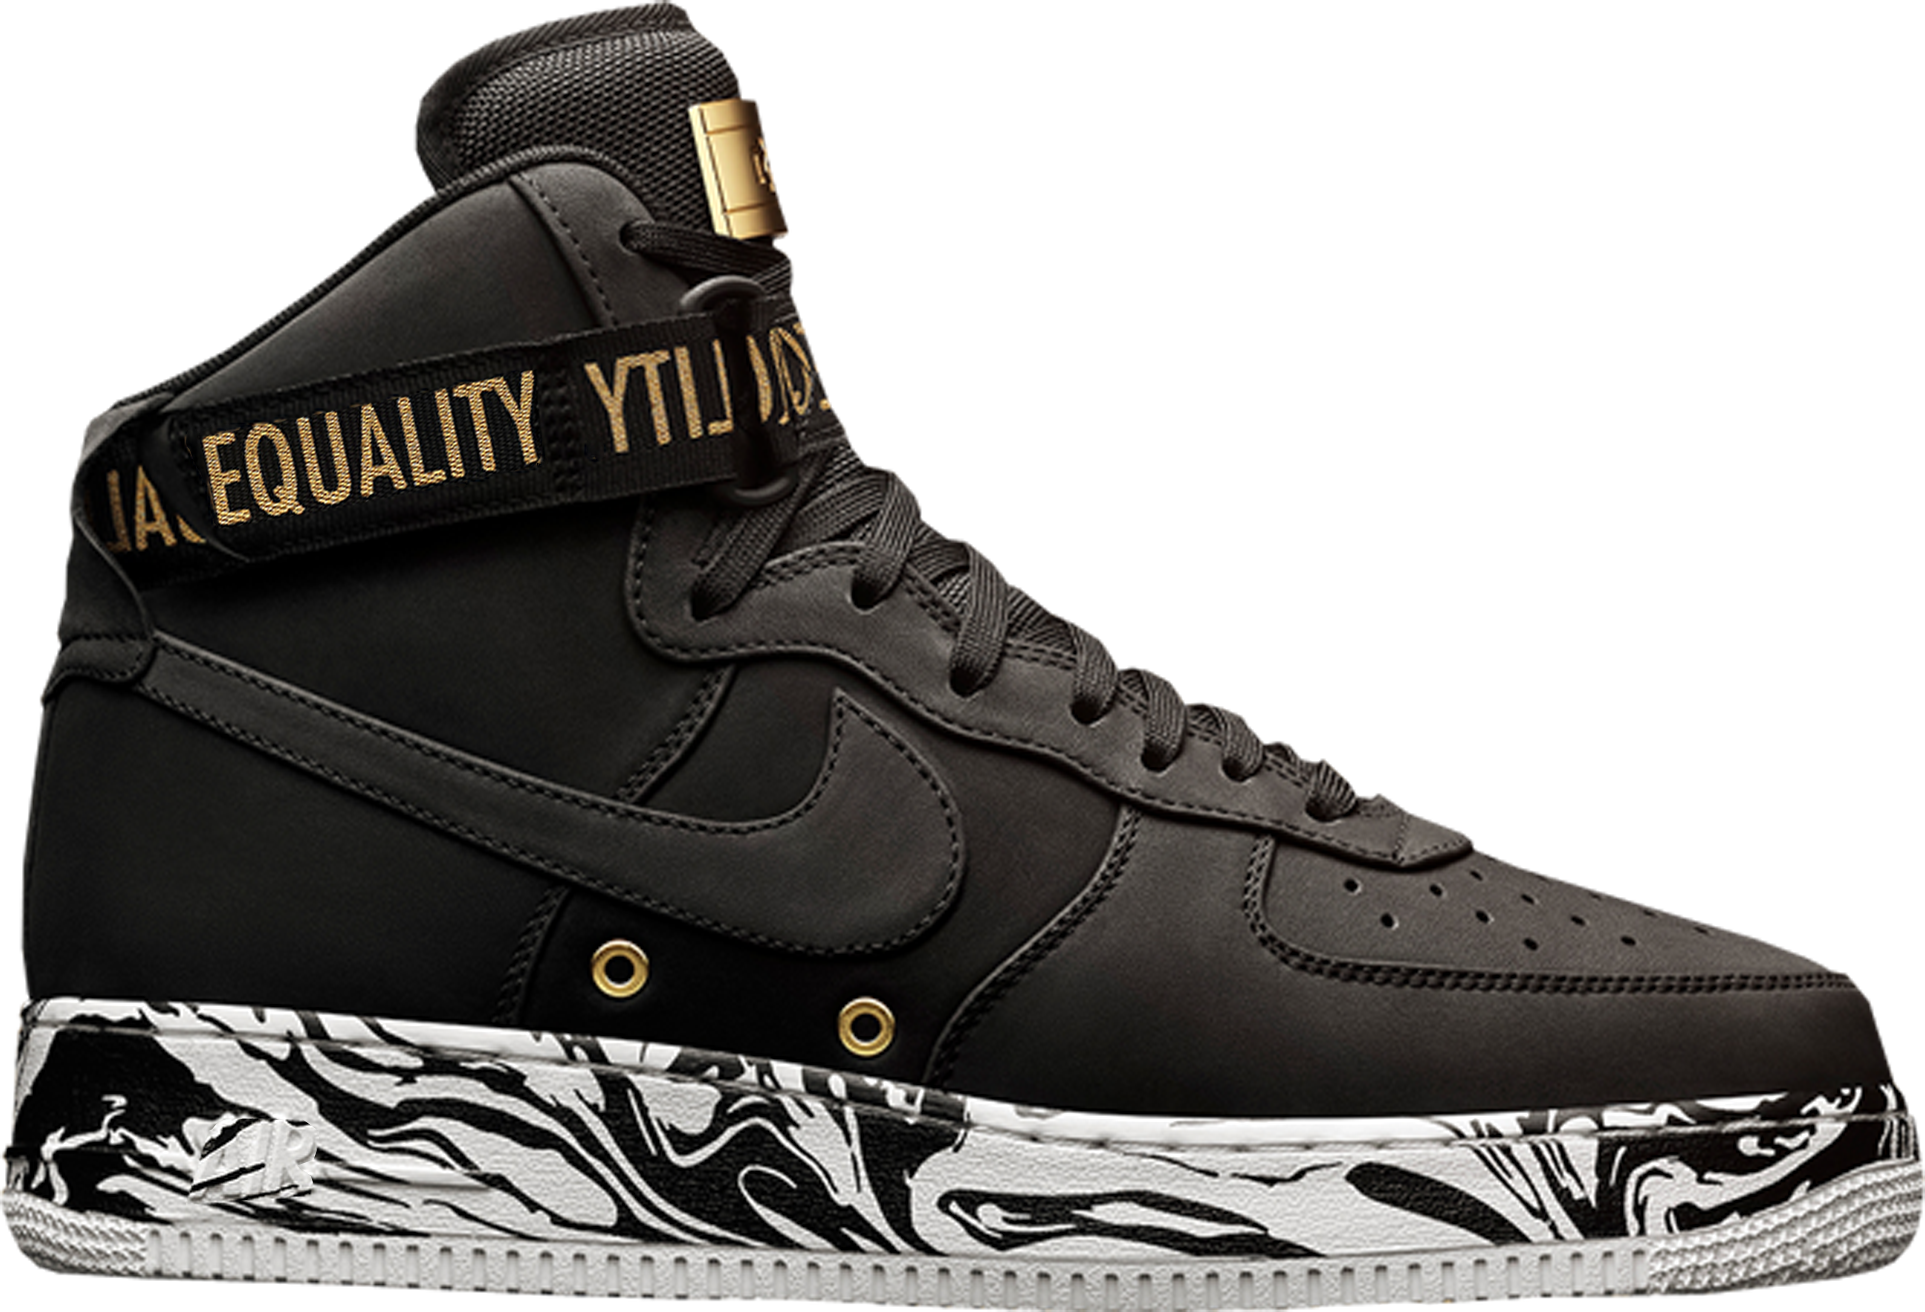 Nike Air Force 1 Sneaker Salut Botte Bhm Bienvenue